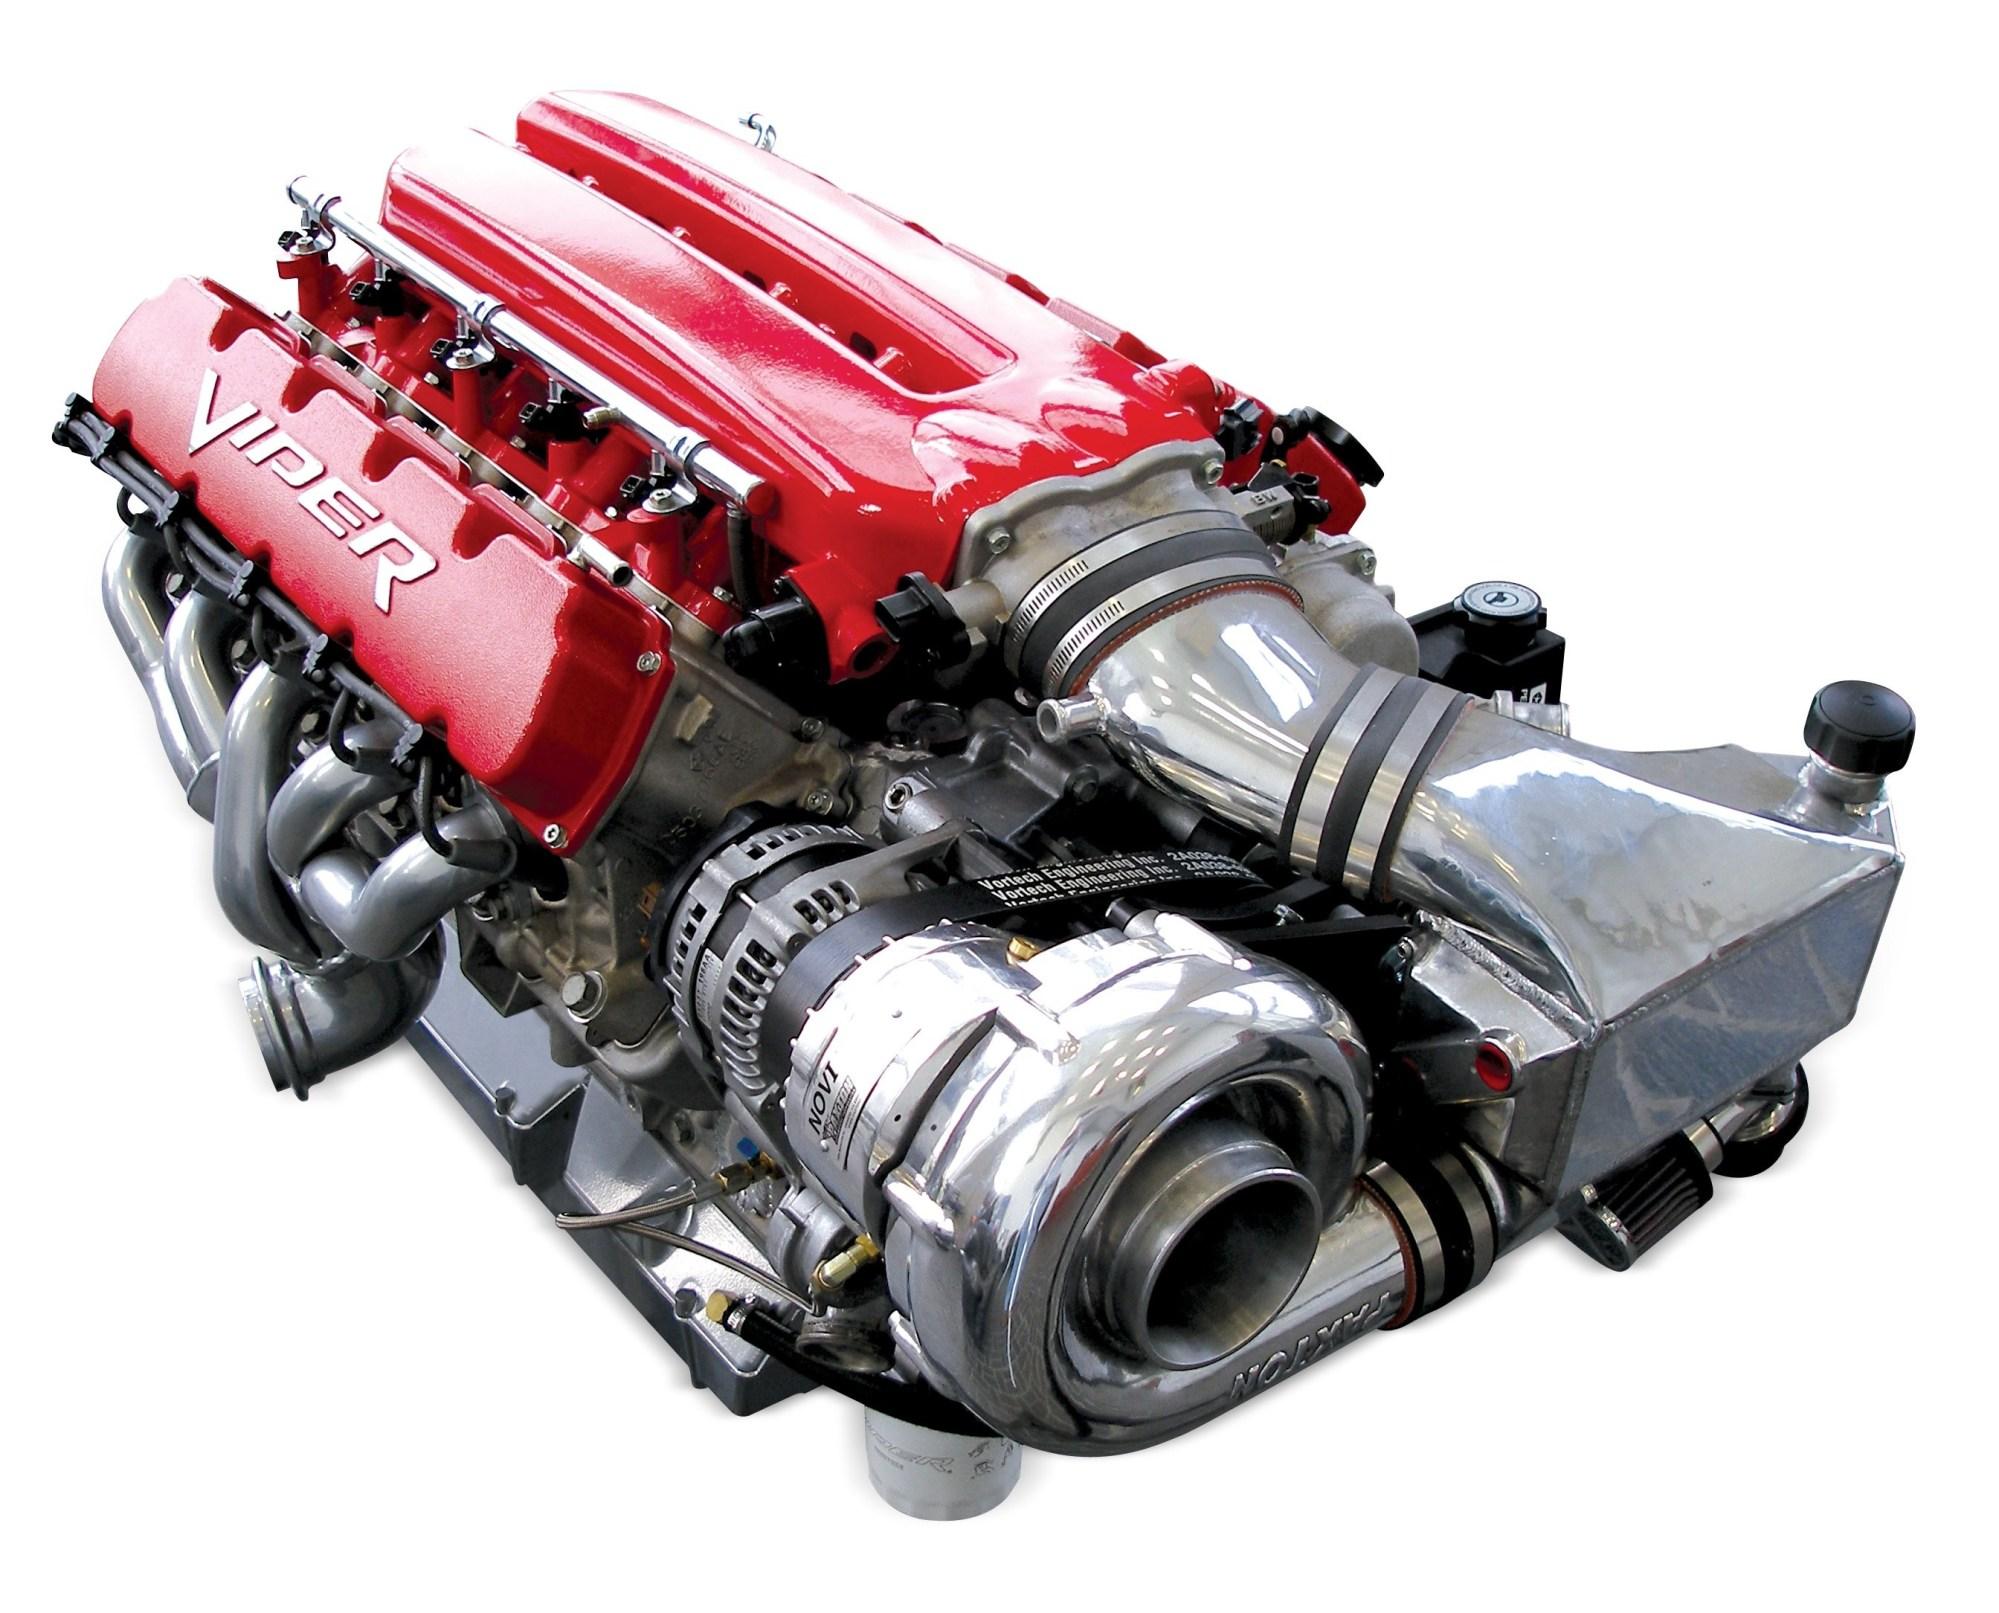 hight resolution of centrifugal supercharger diagram 2003 2006 dodge viper srt 2007 honda civic engine diagram 2007 honda civic si engine